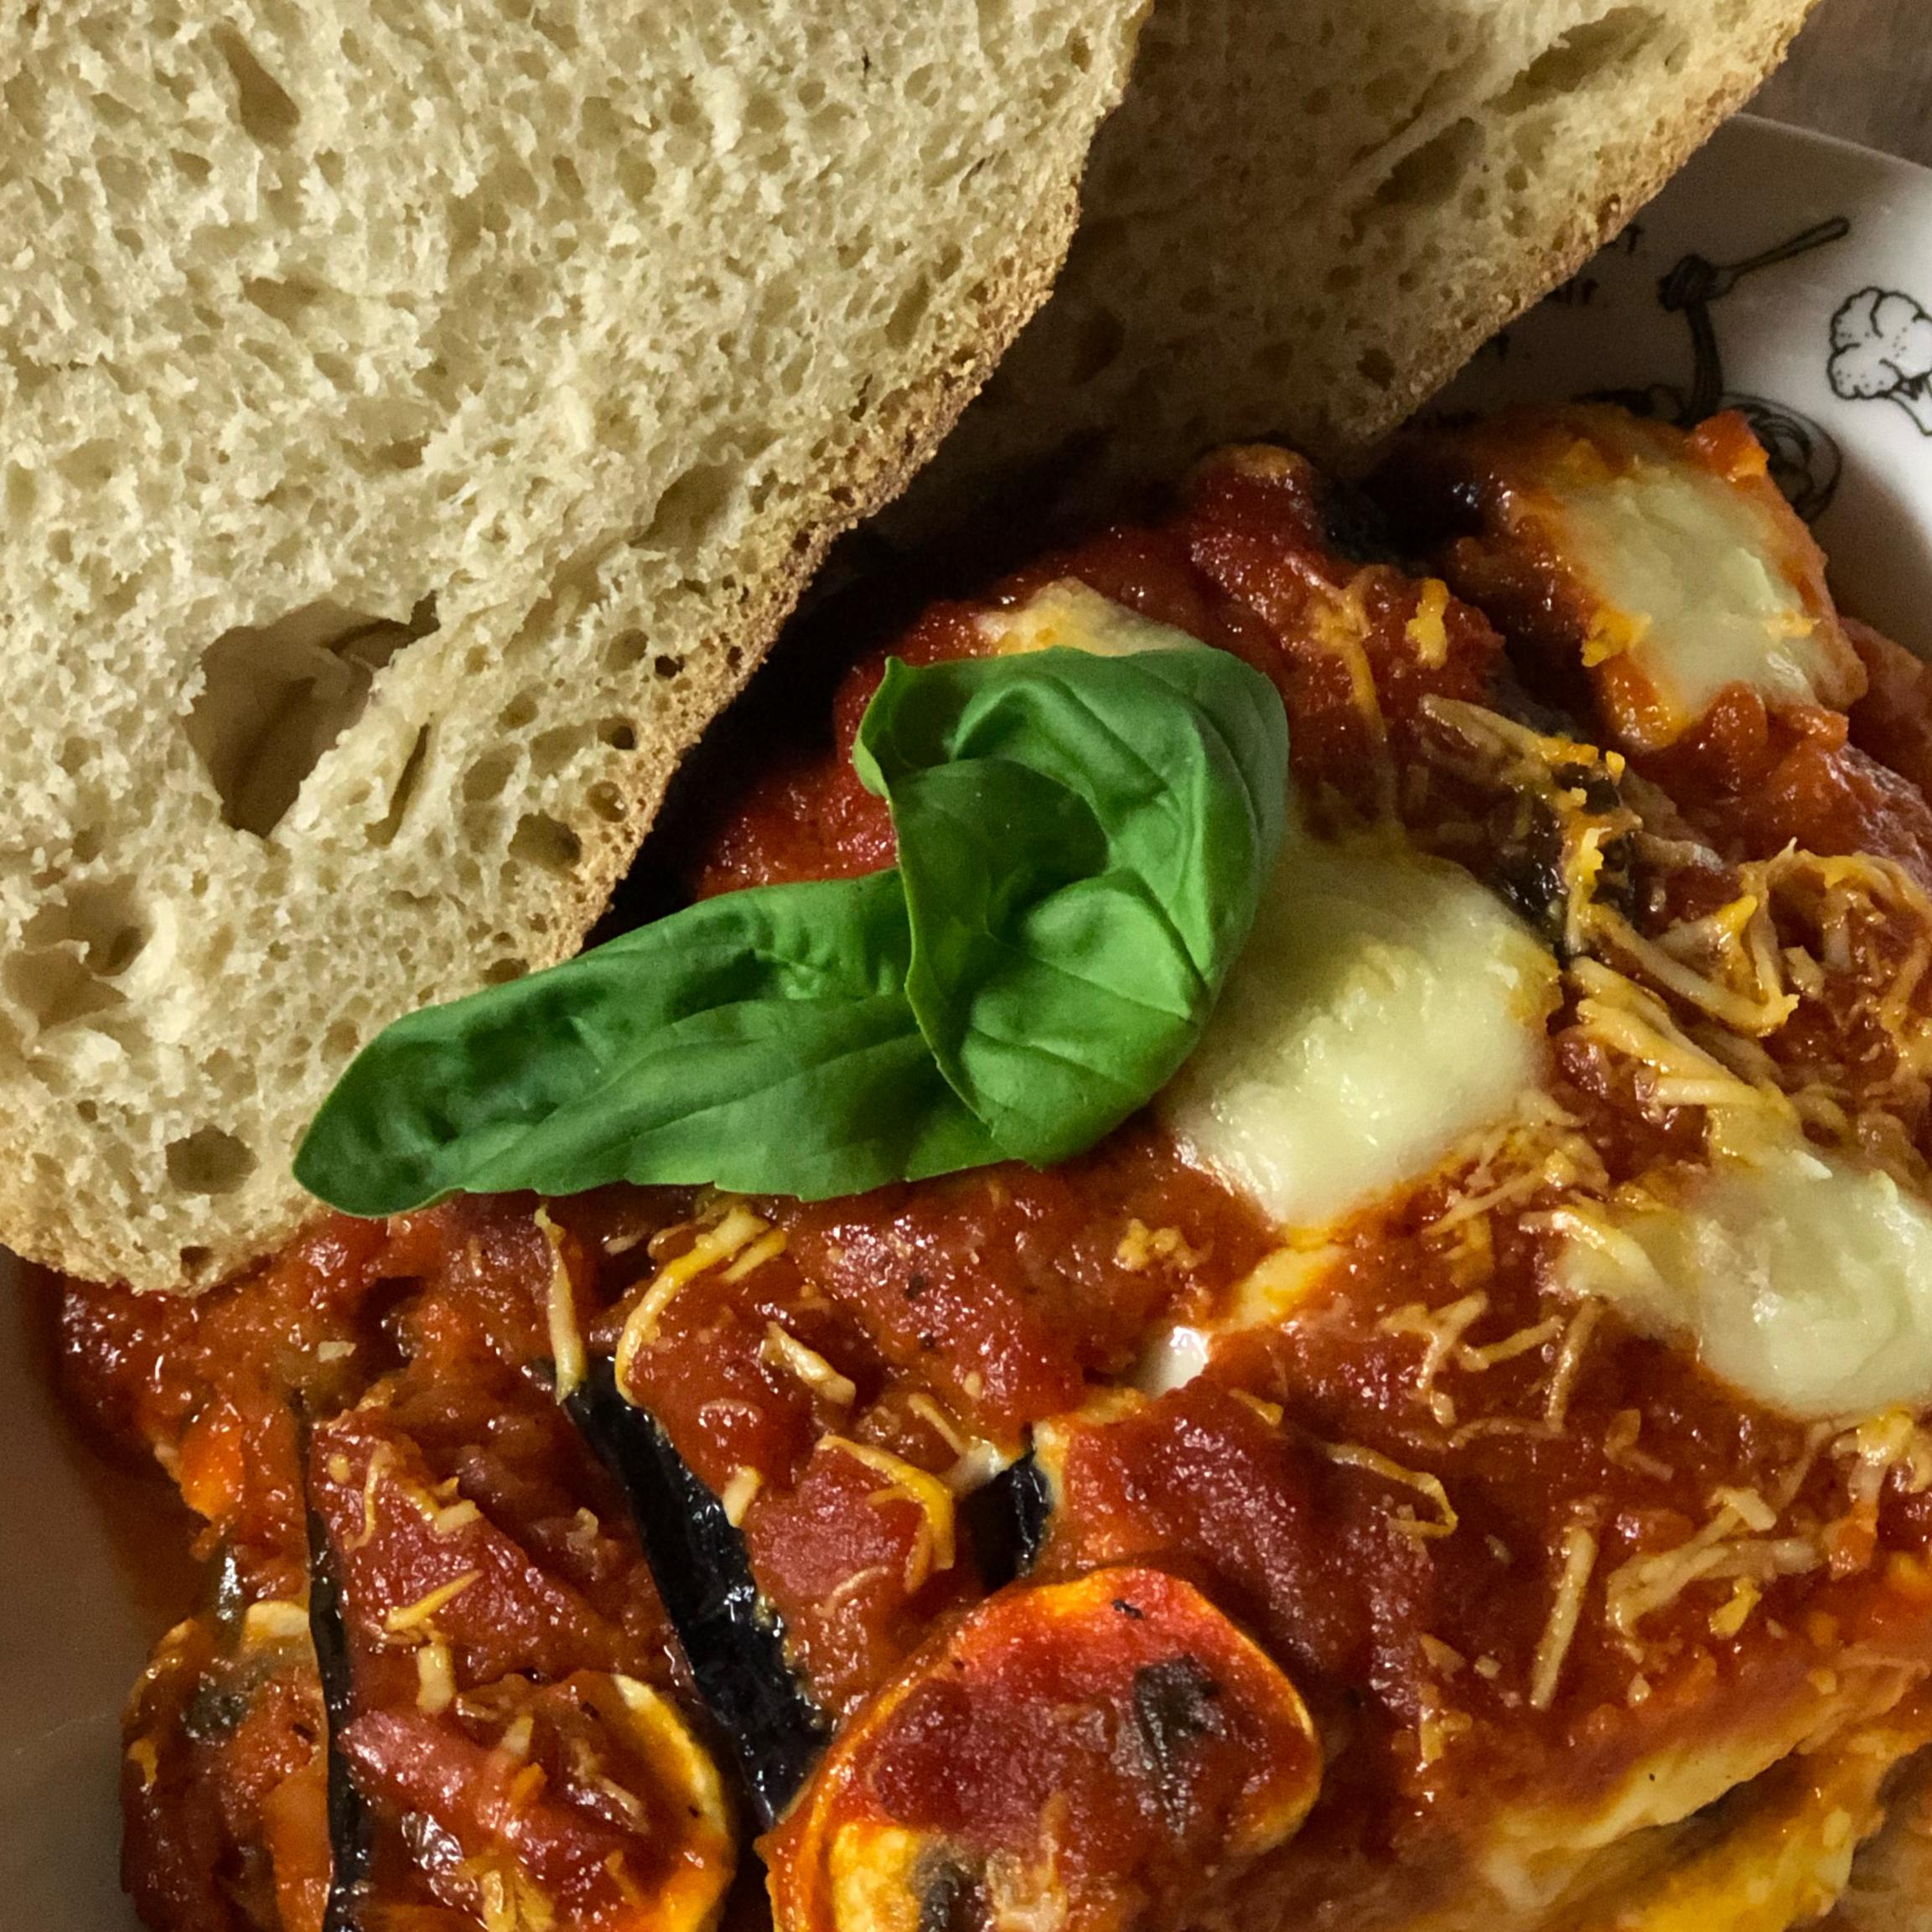 Italian Baked Eggplant with Parmesan (Parmigiana di Melanzane) Kris Murzyn